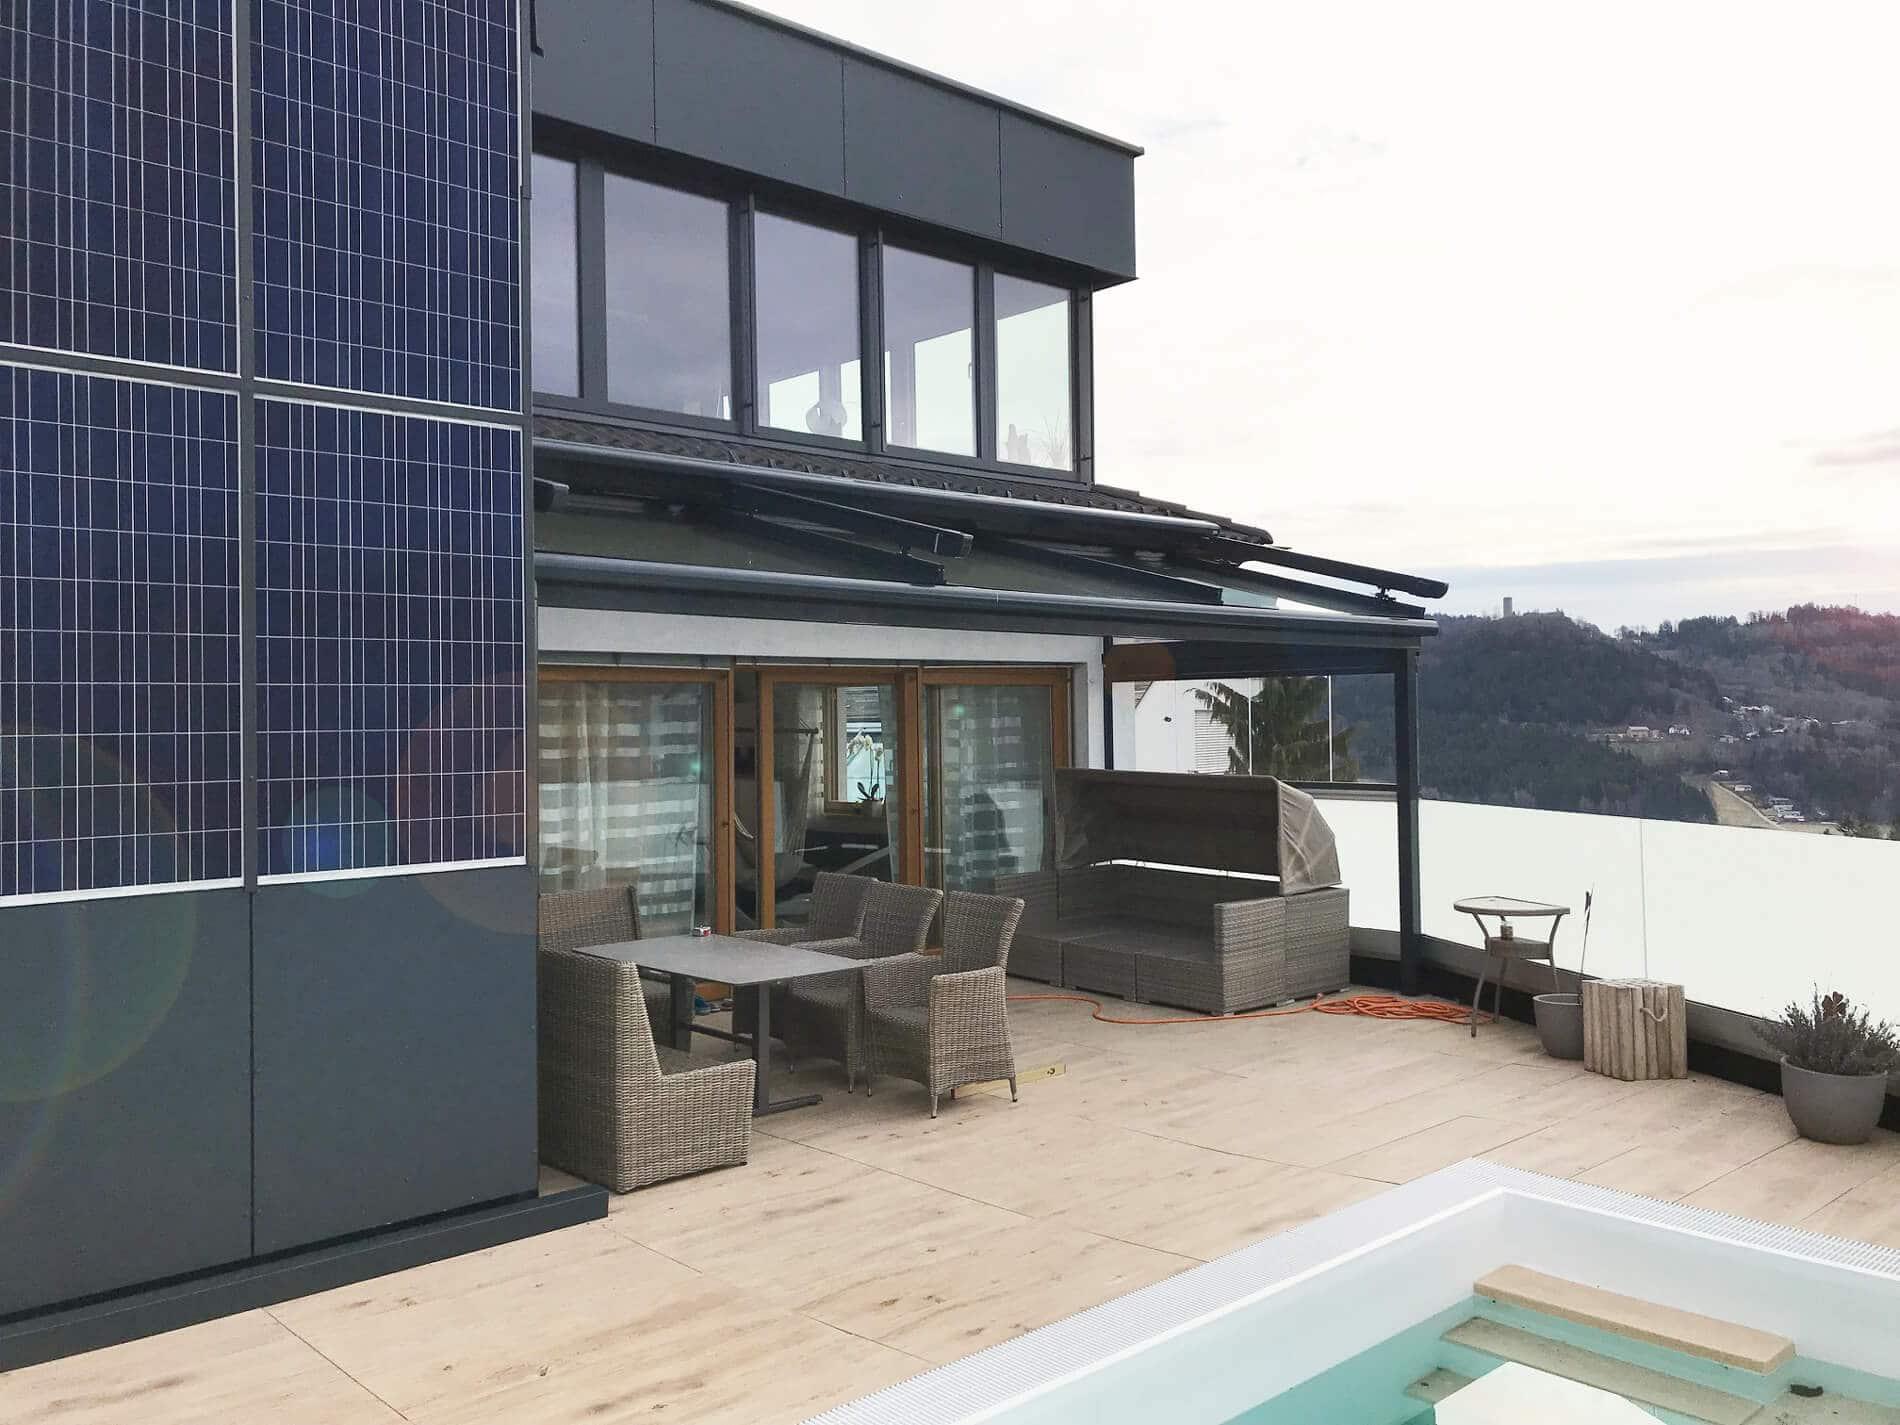 Terrassenüberdachung Glas nach Maßanfertigung